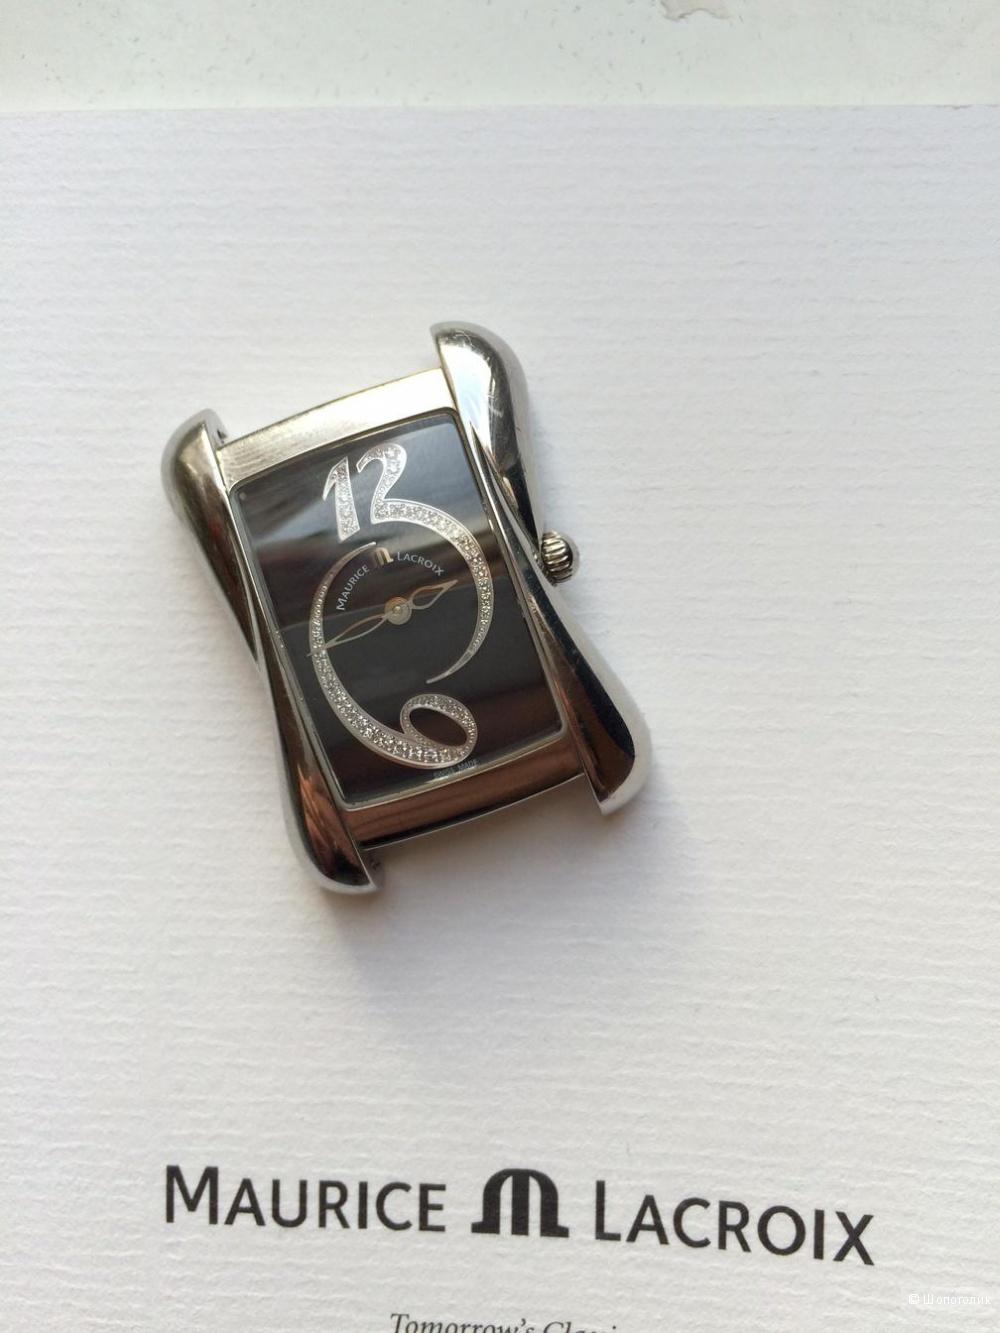 Кварцевые часы Maurice Lacroix. Коллекция Divina, украшена  28 бриллиантами (0.152 К).